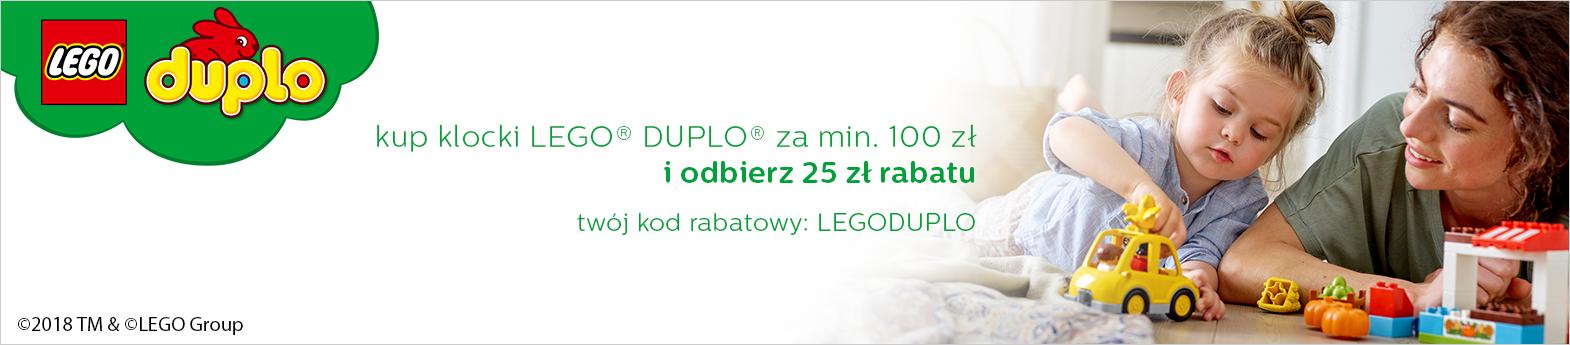 Promocja LEGO Duplo